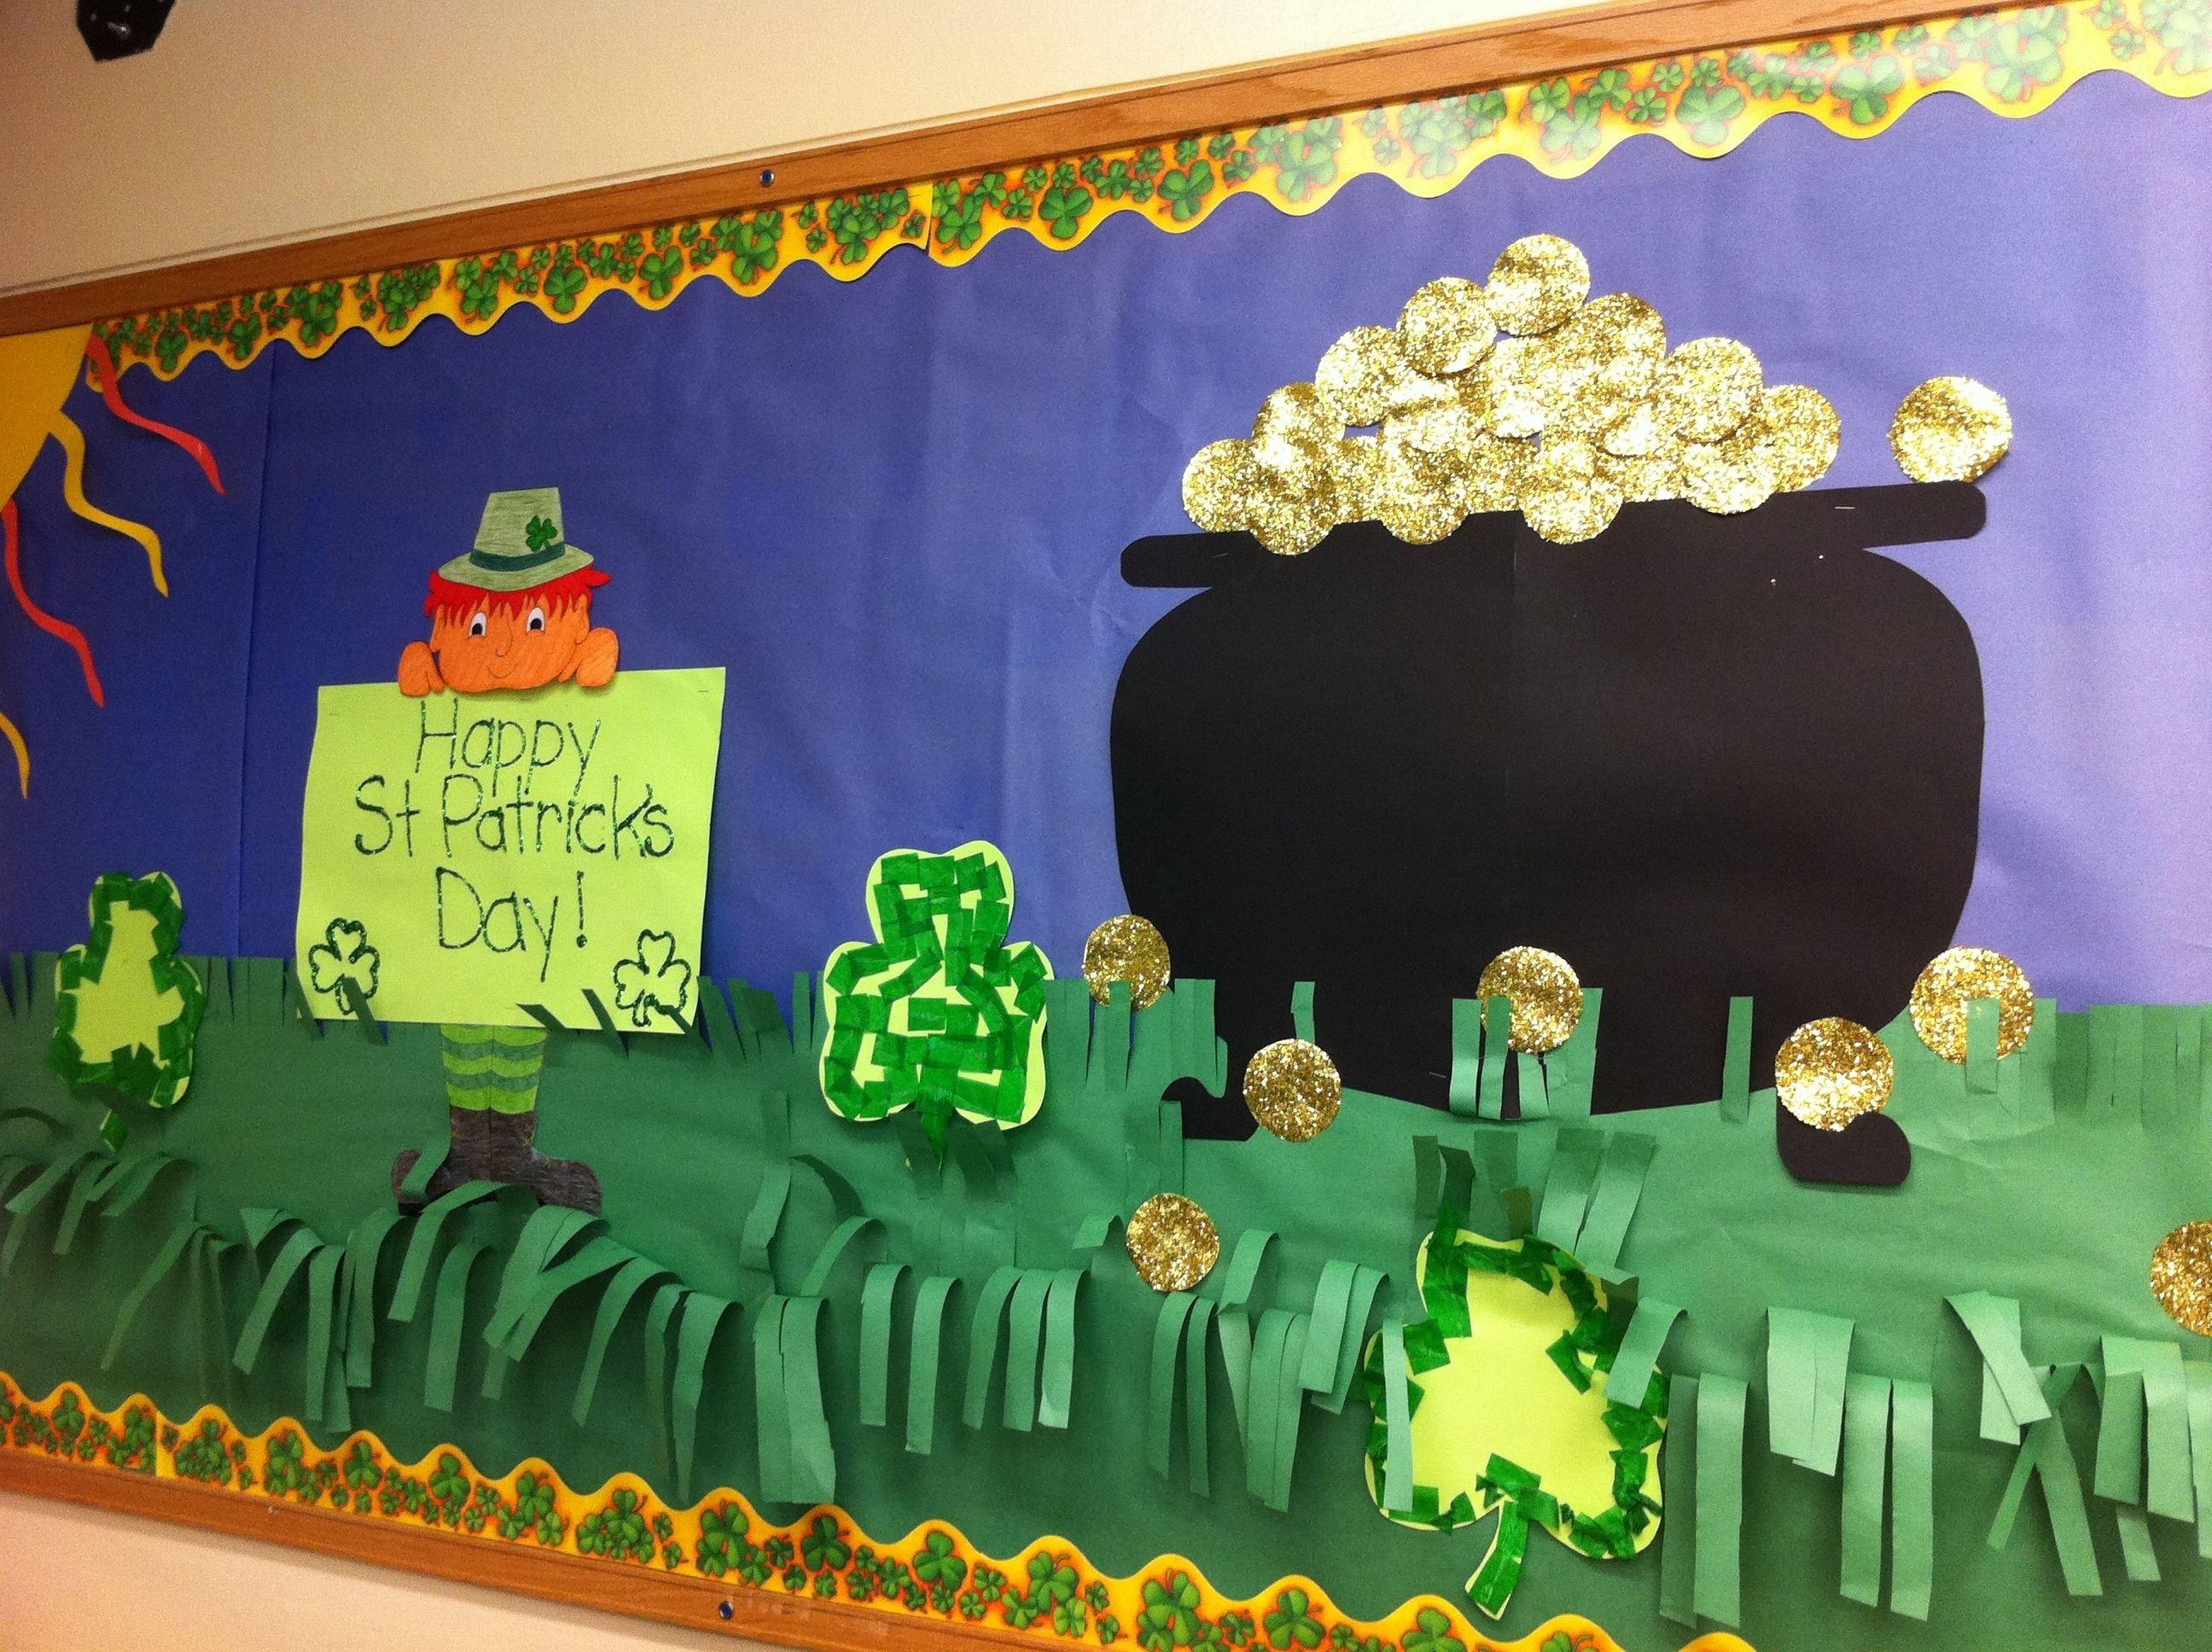 10 Stylish Preschool March Bulletin Board Ideas march bulletin board school ideas pinterest bulletin board 2 2020